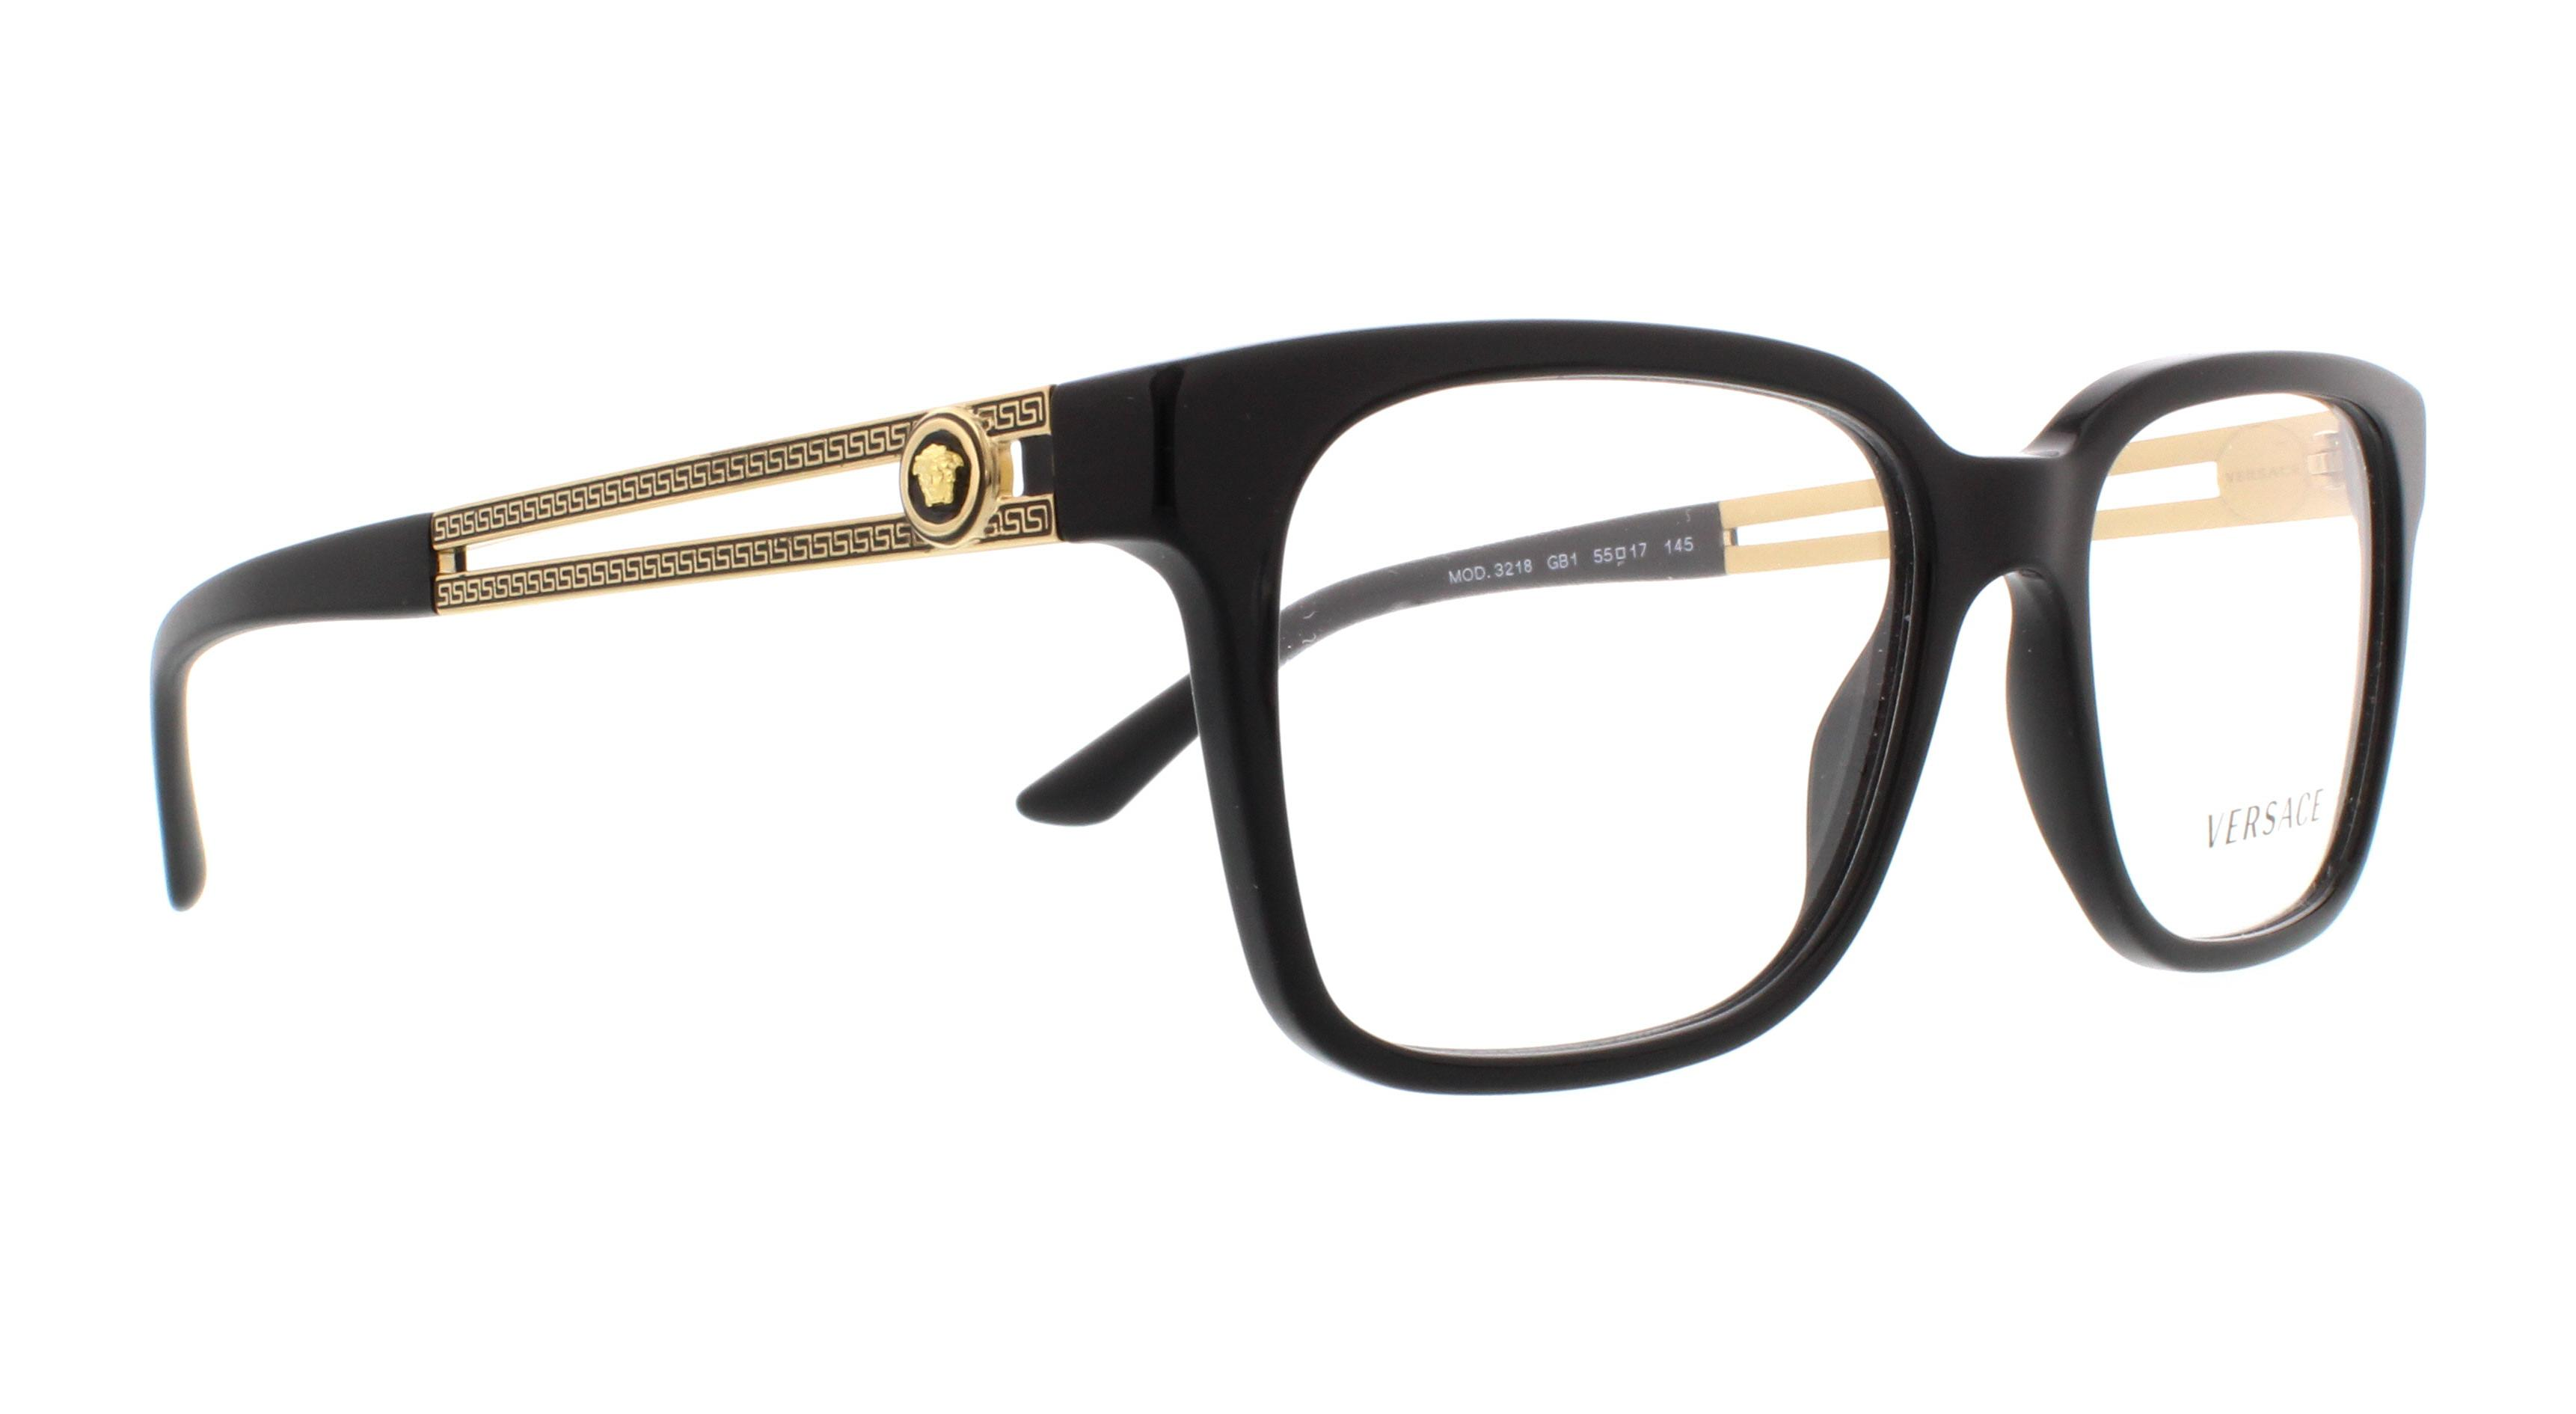 034f2f870ed2 VERSACE Eyeglasses VE3218 GB1 Black 55MM - Walmart.com